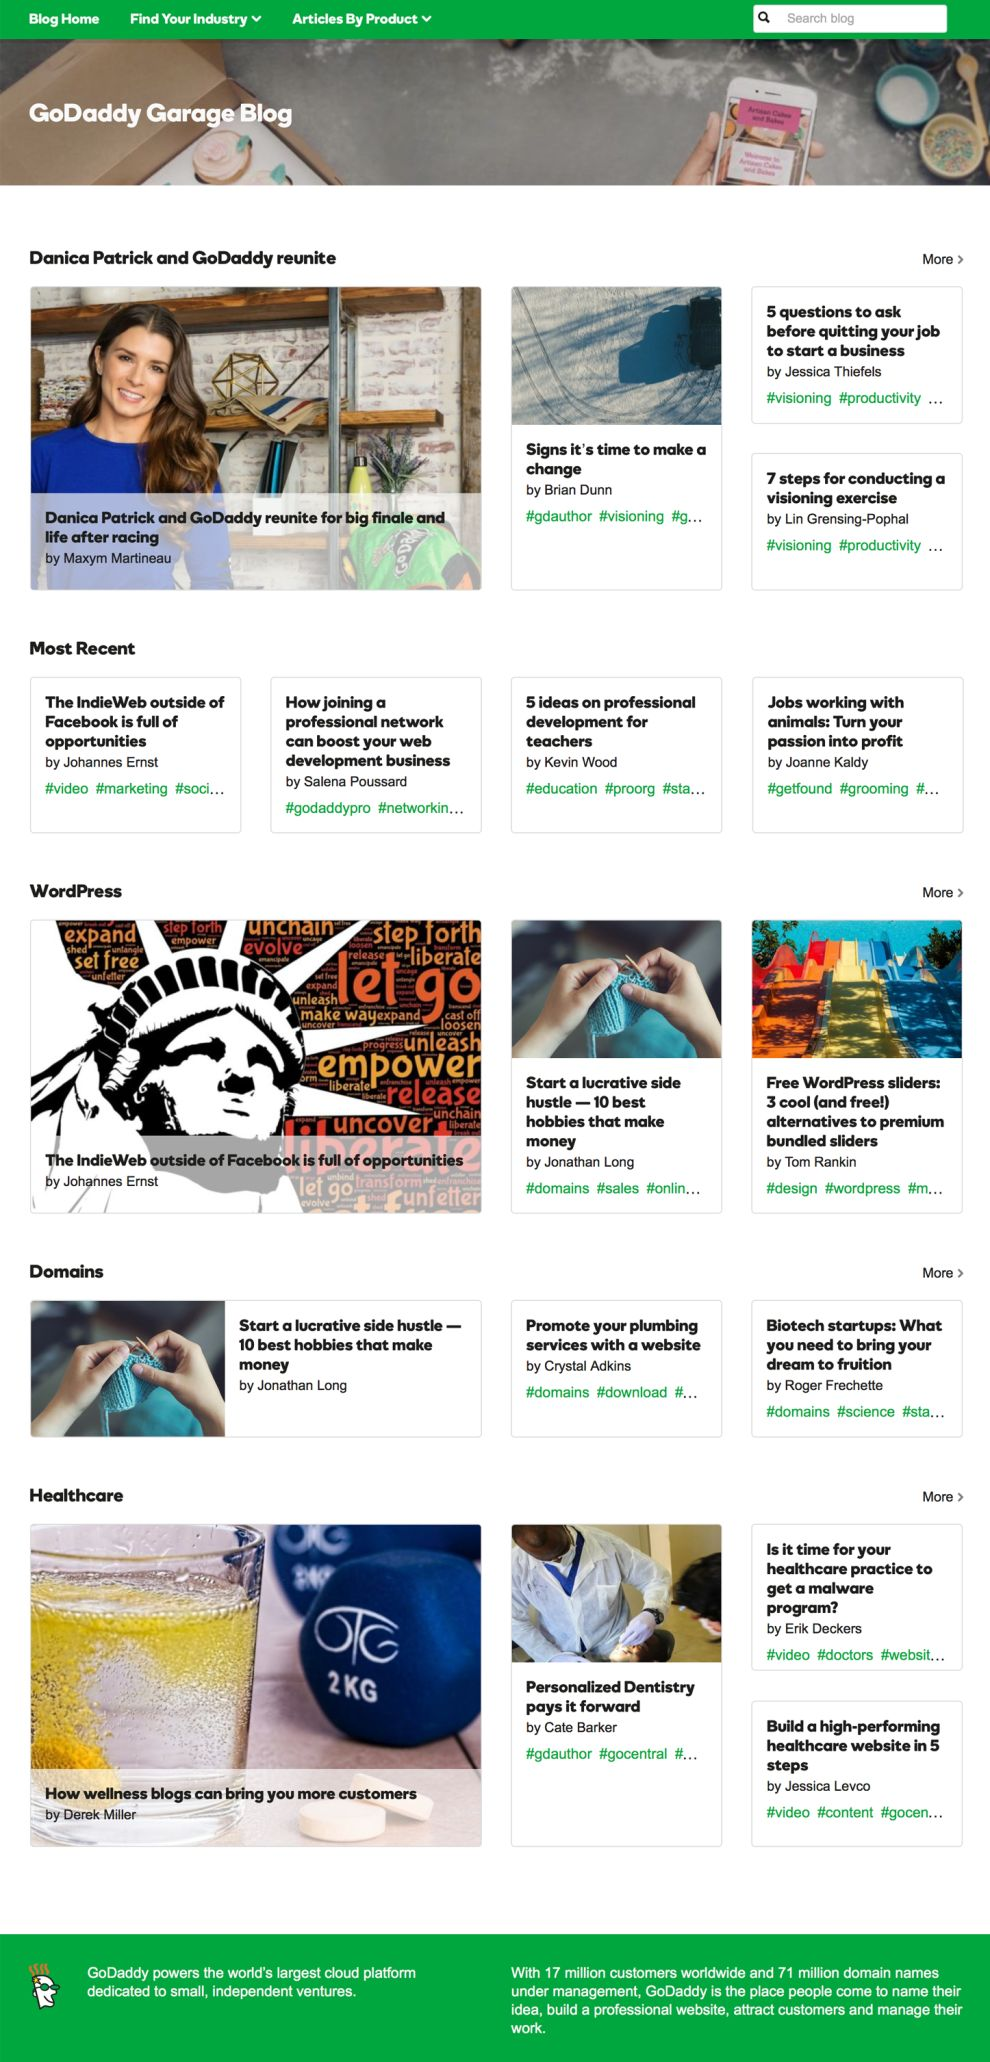 GoDaddy Clean Blog Page